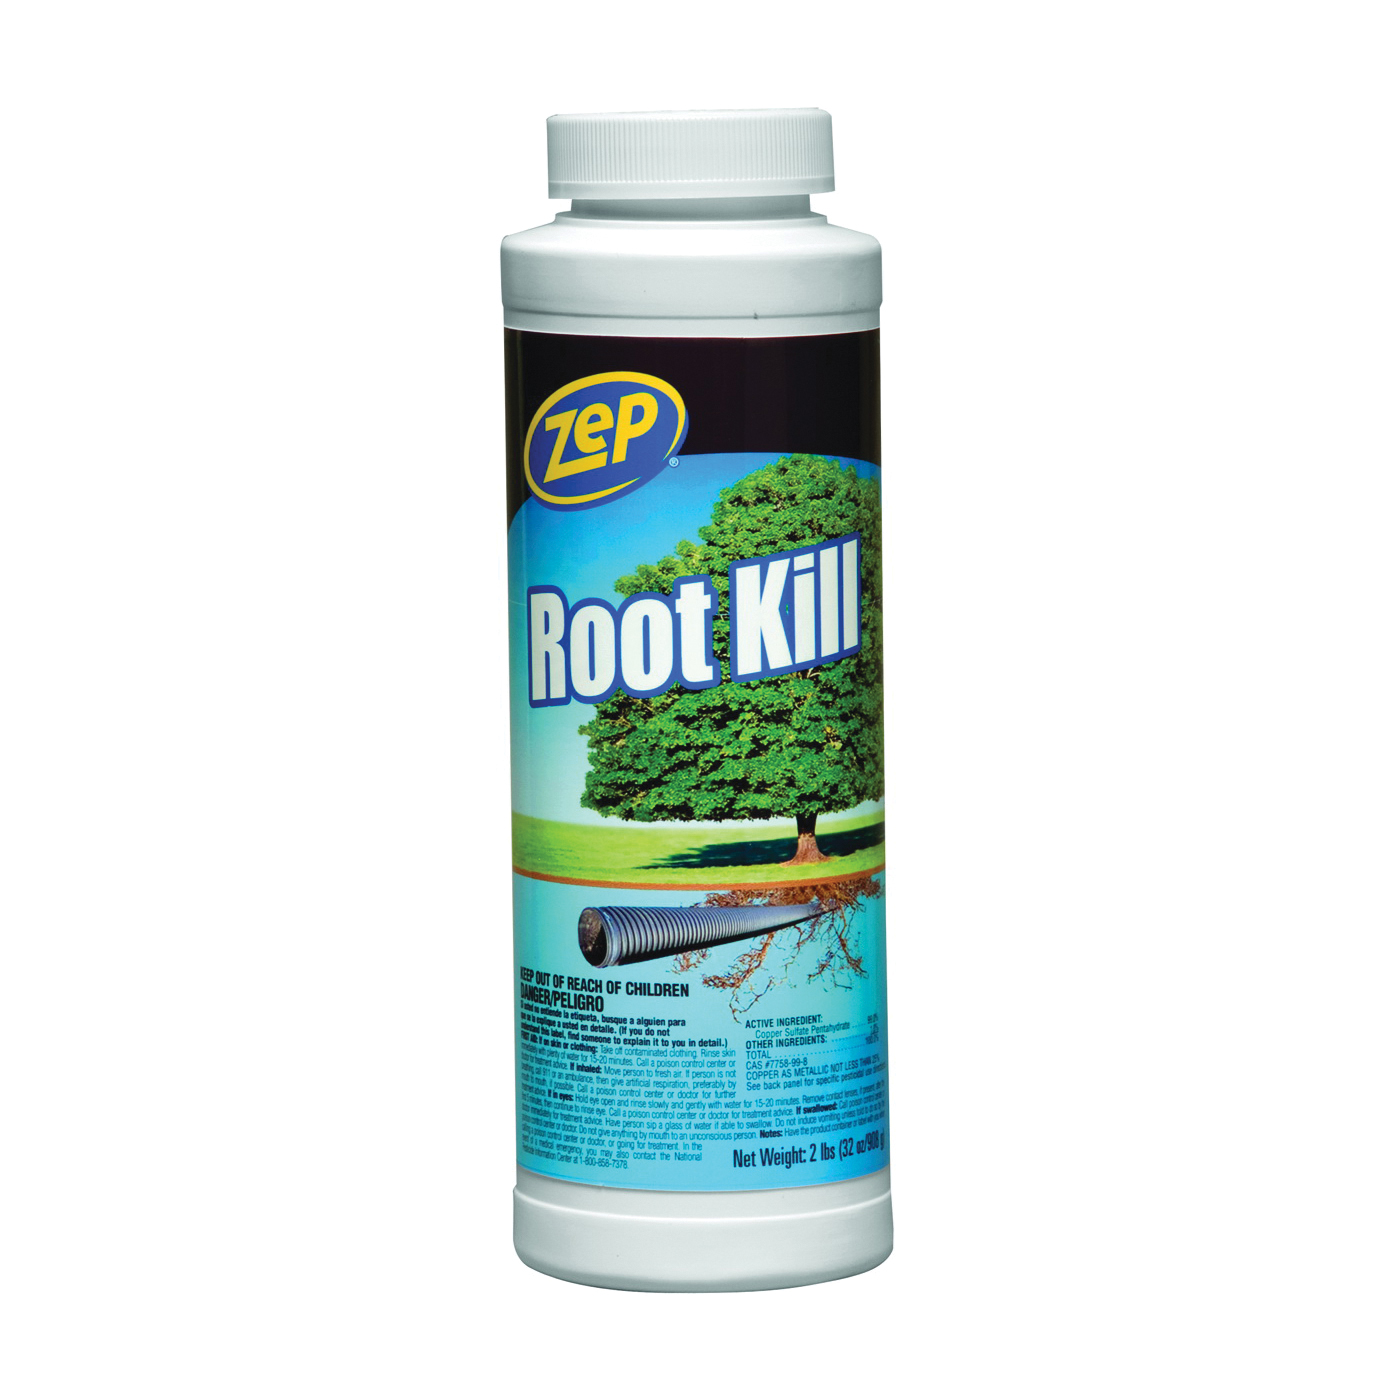 Picture of Zep ZROOT24 Commercial Root Killer, Granular Solid